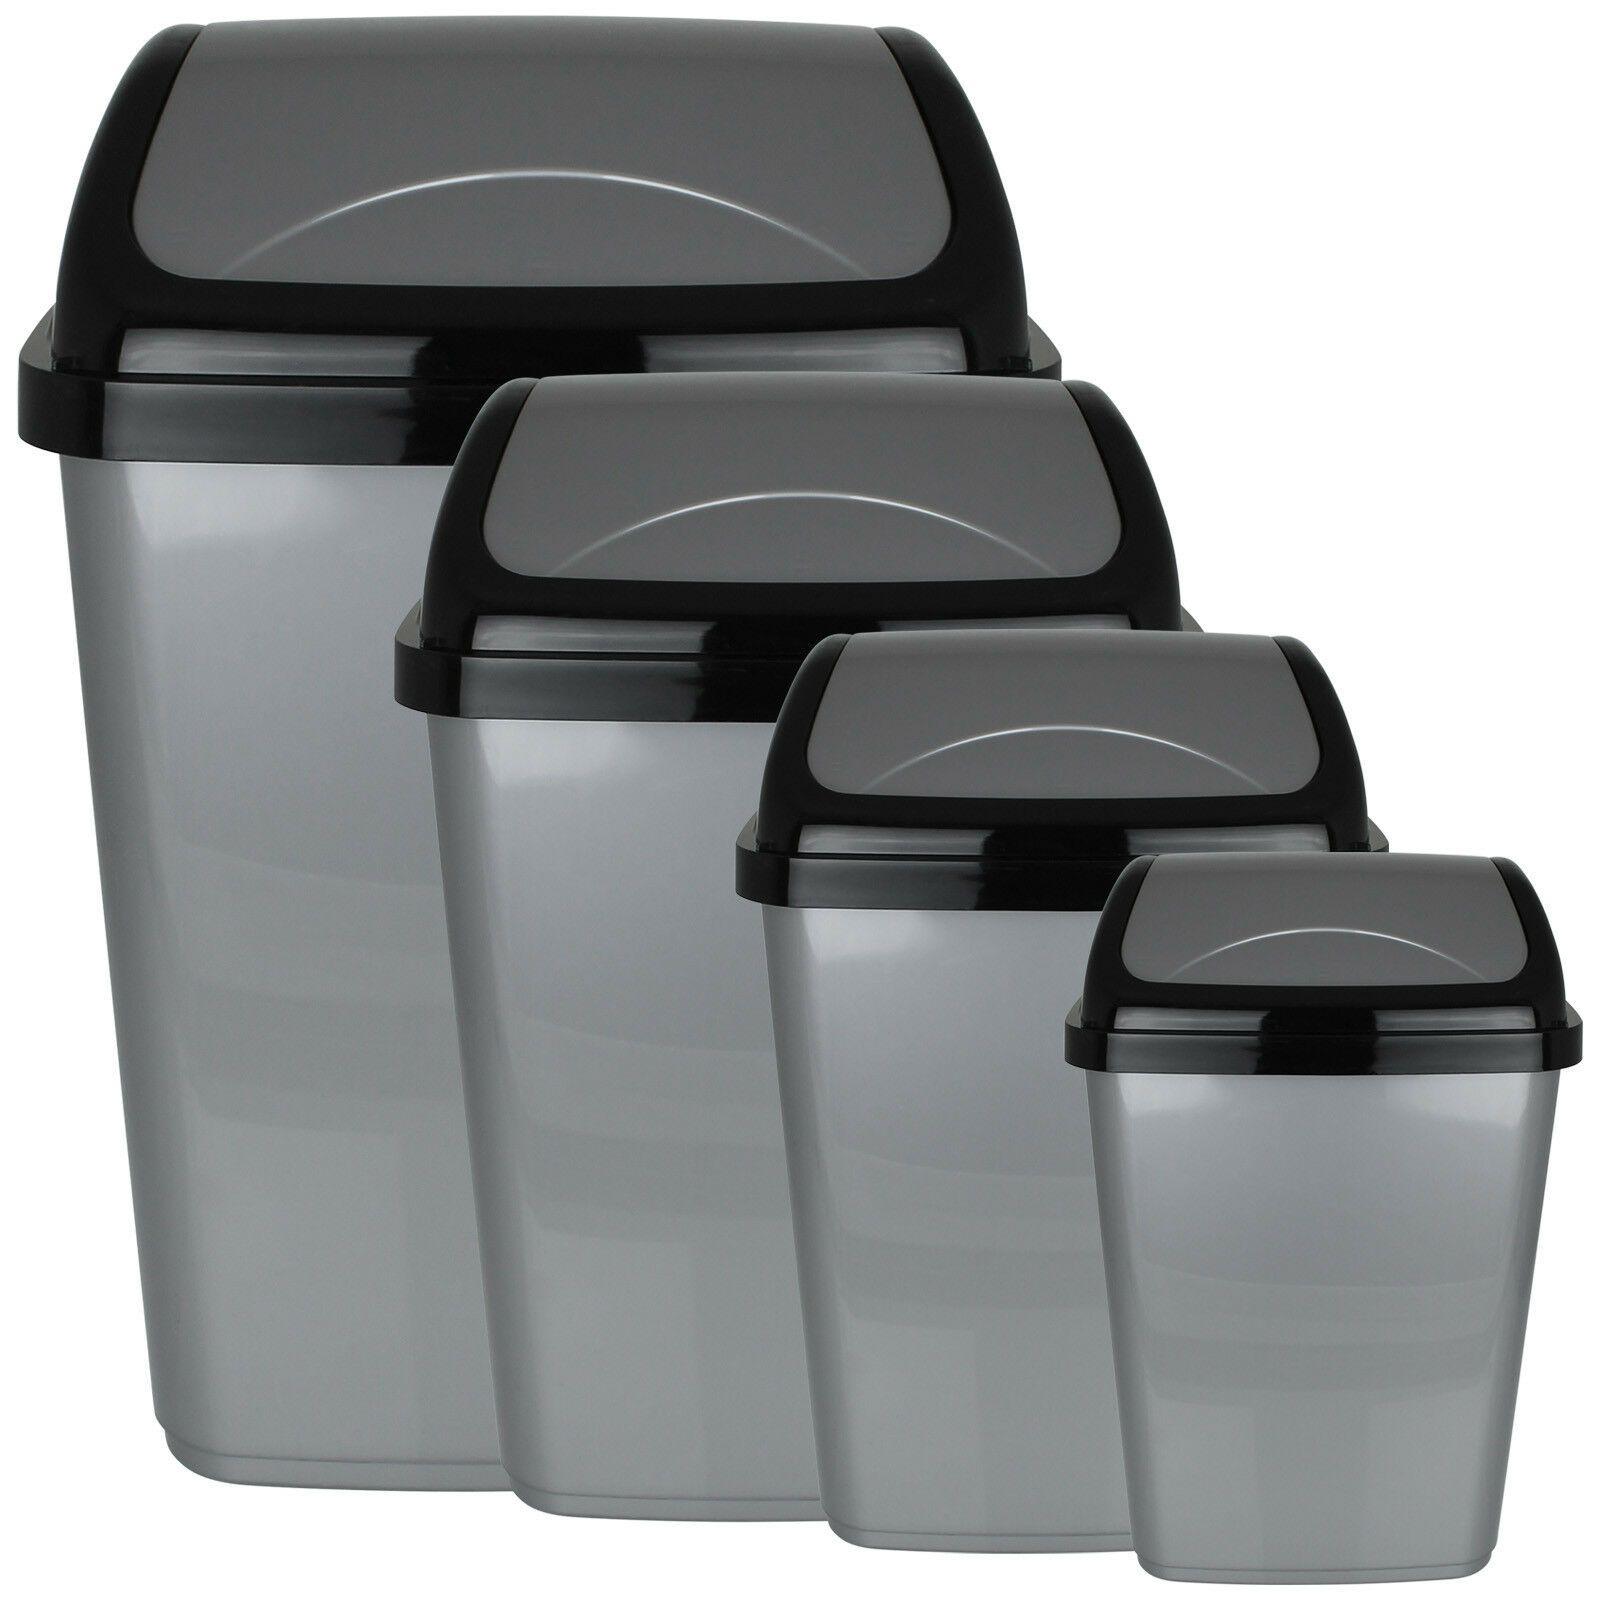 Full Size of Abfalleimer Küche Einbau Ikea Abfalleimer Küche System Abfalleimer Küche 3 Fach Design Abfalleimer Küche Küche Abfalleimer Küche